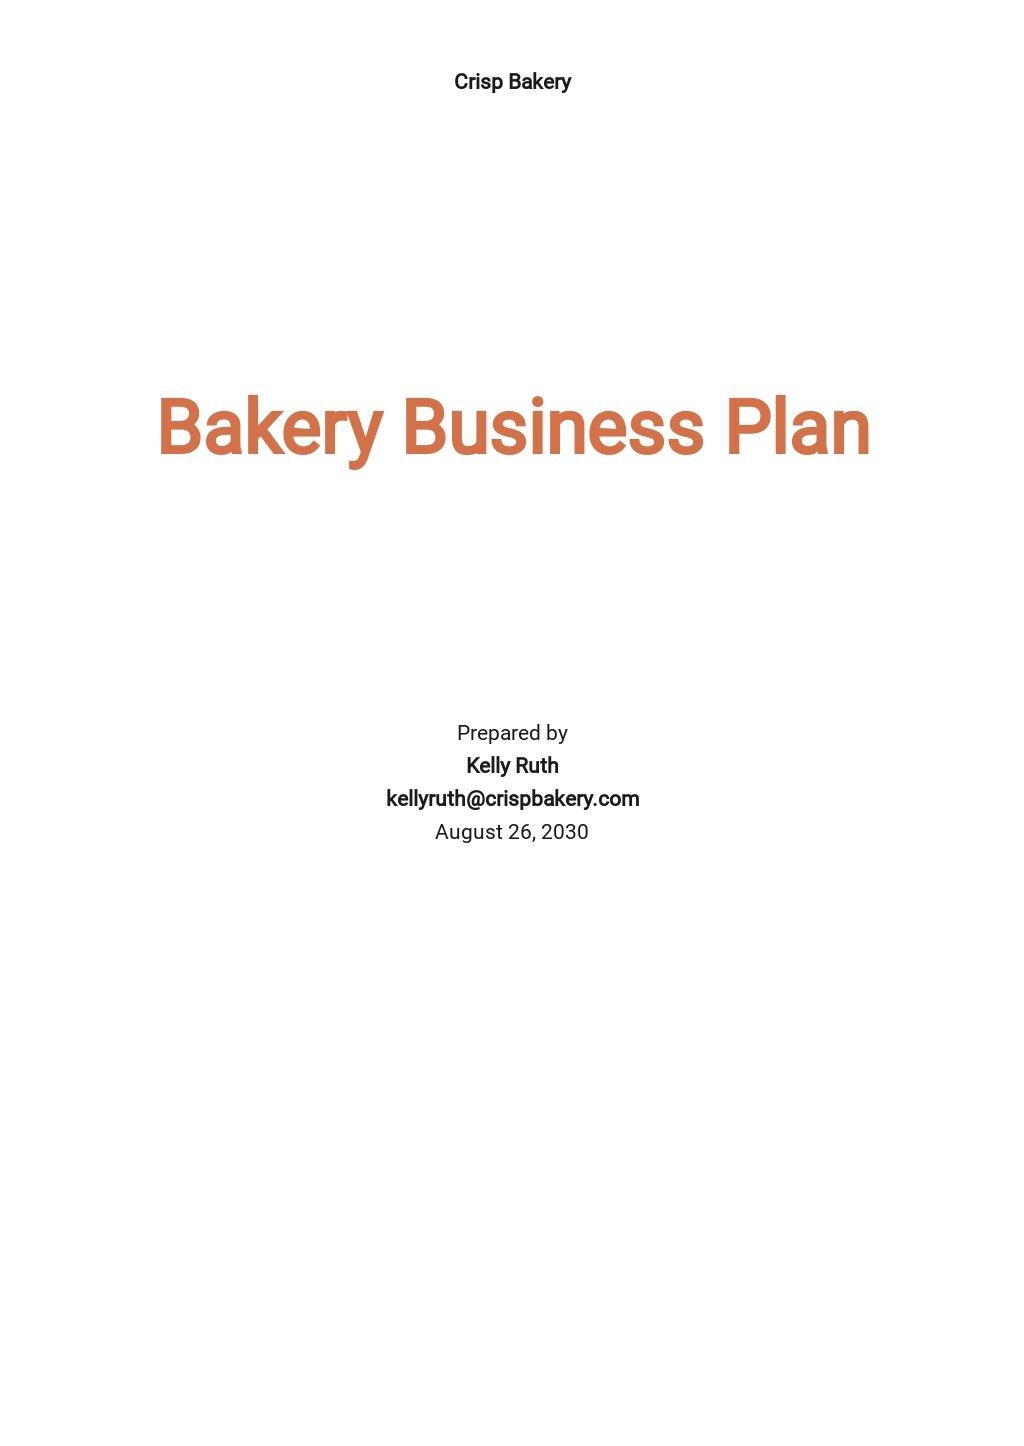 Bakery Business Plan Template